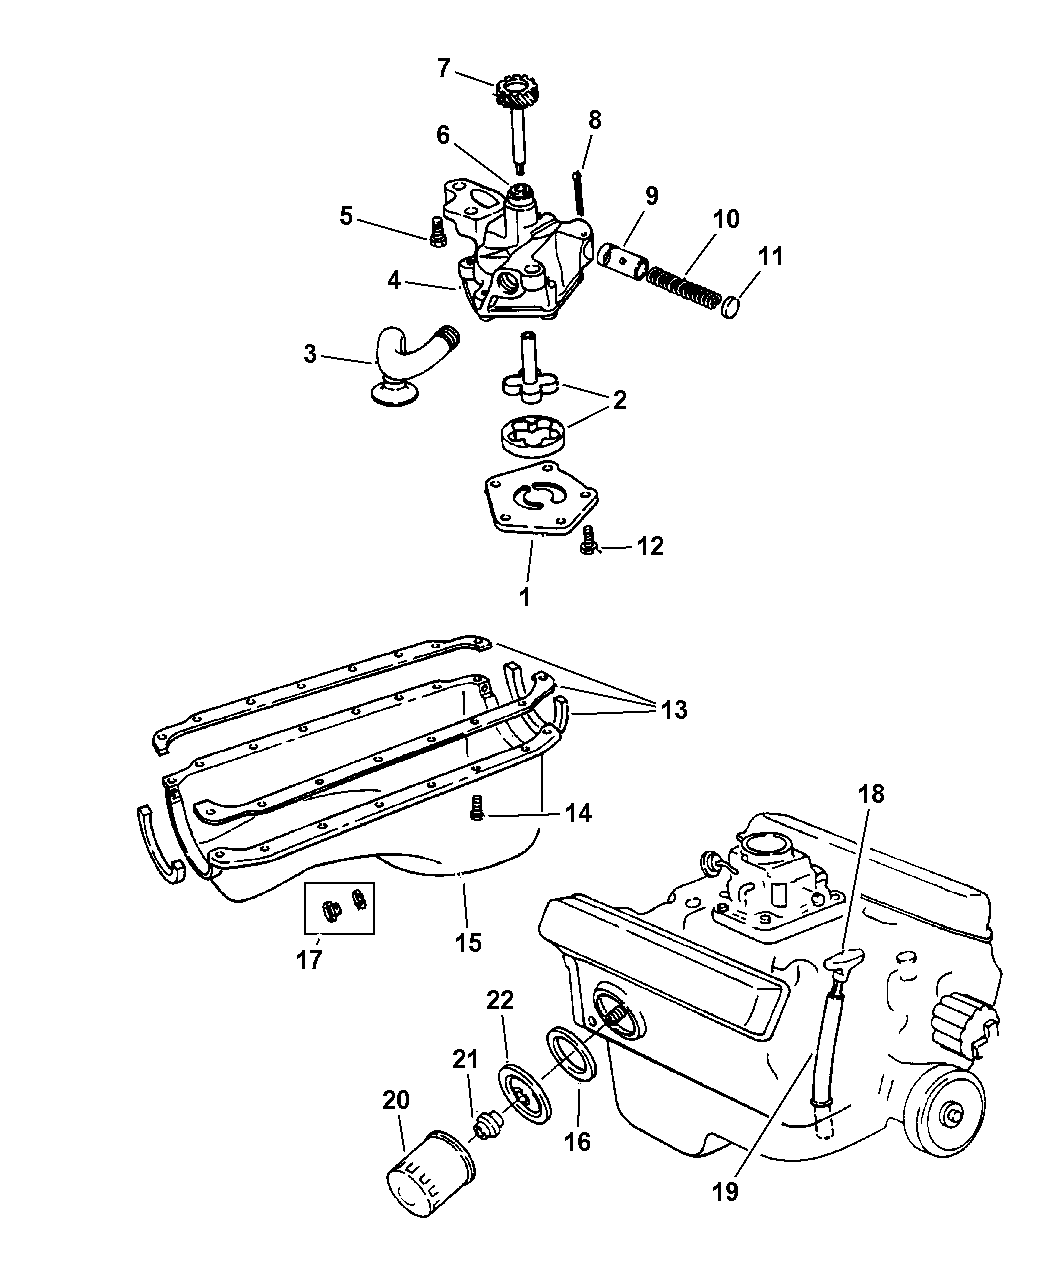 1997 Dodge Ram 1500 Engine: Genuine Dodge INDICATOR-ENGINE OIL LEVEL